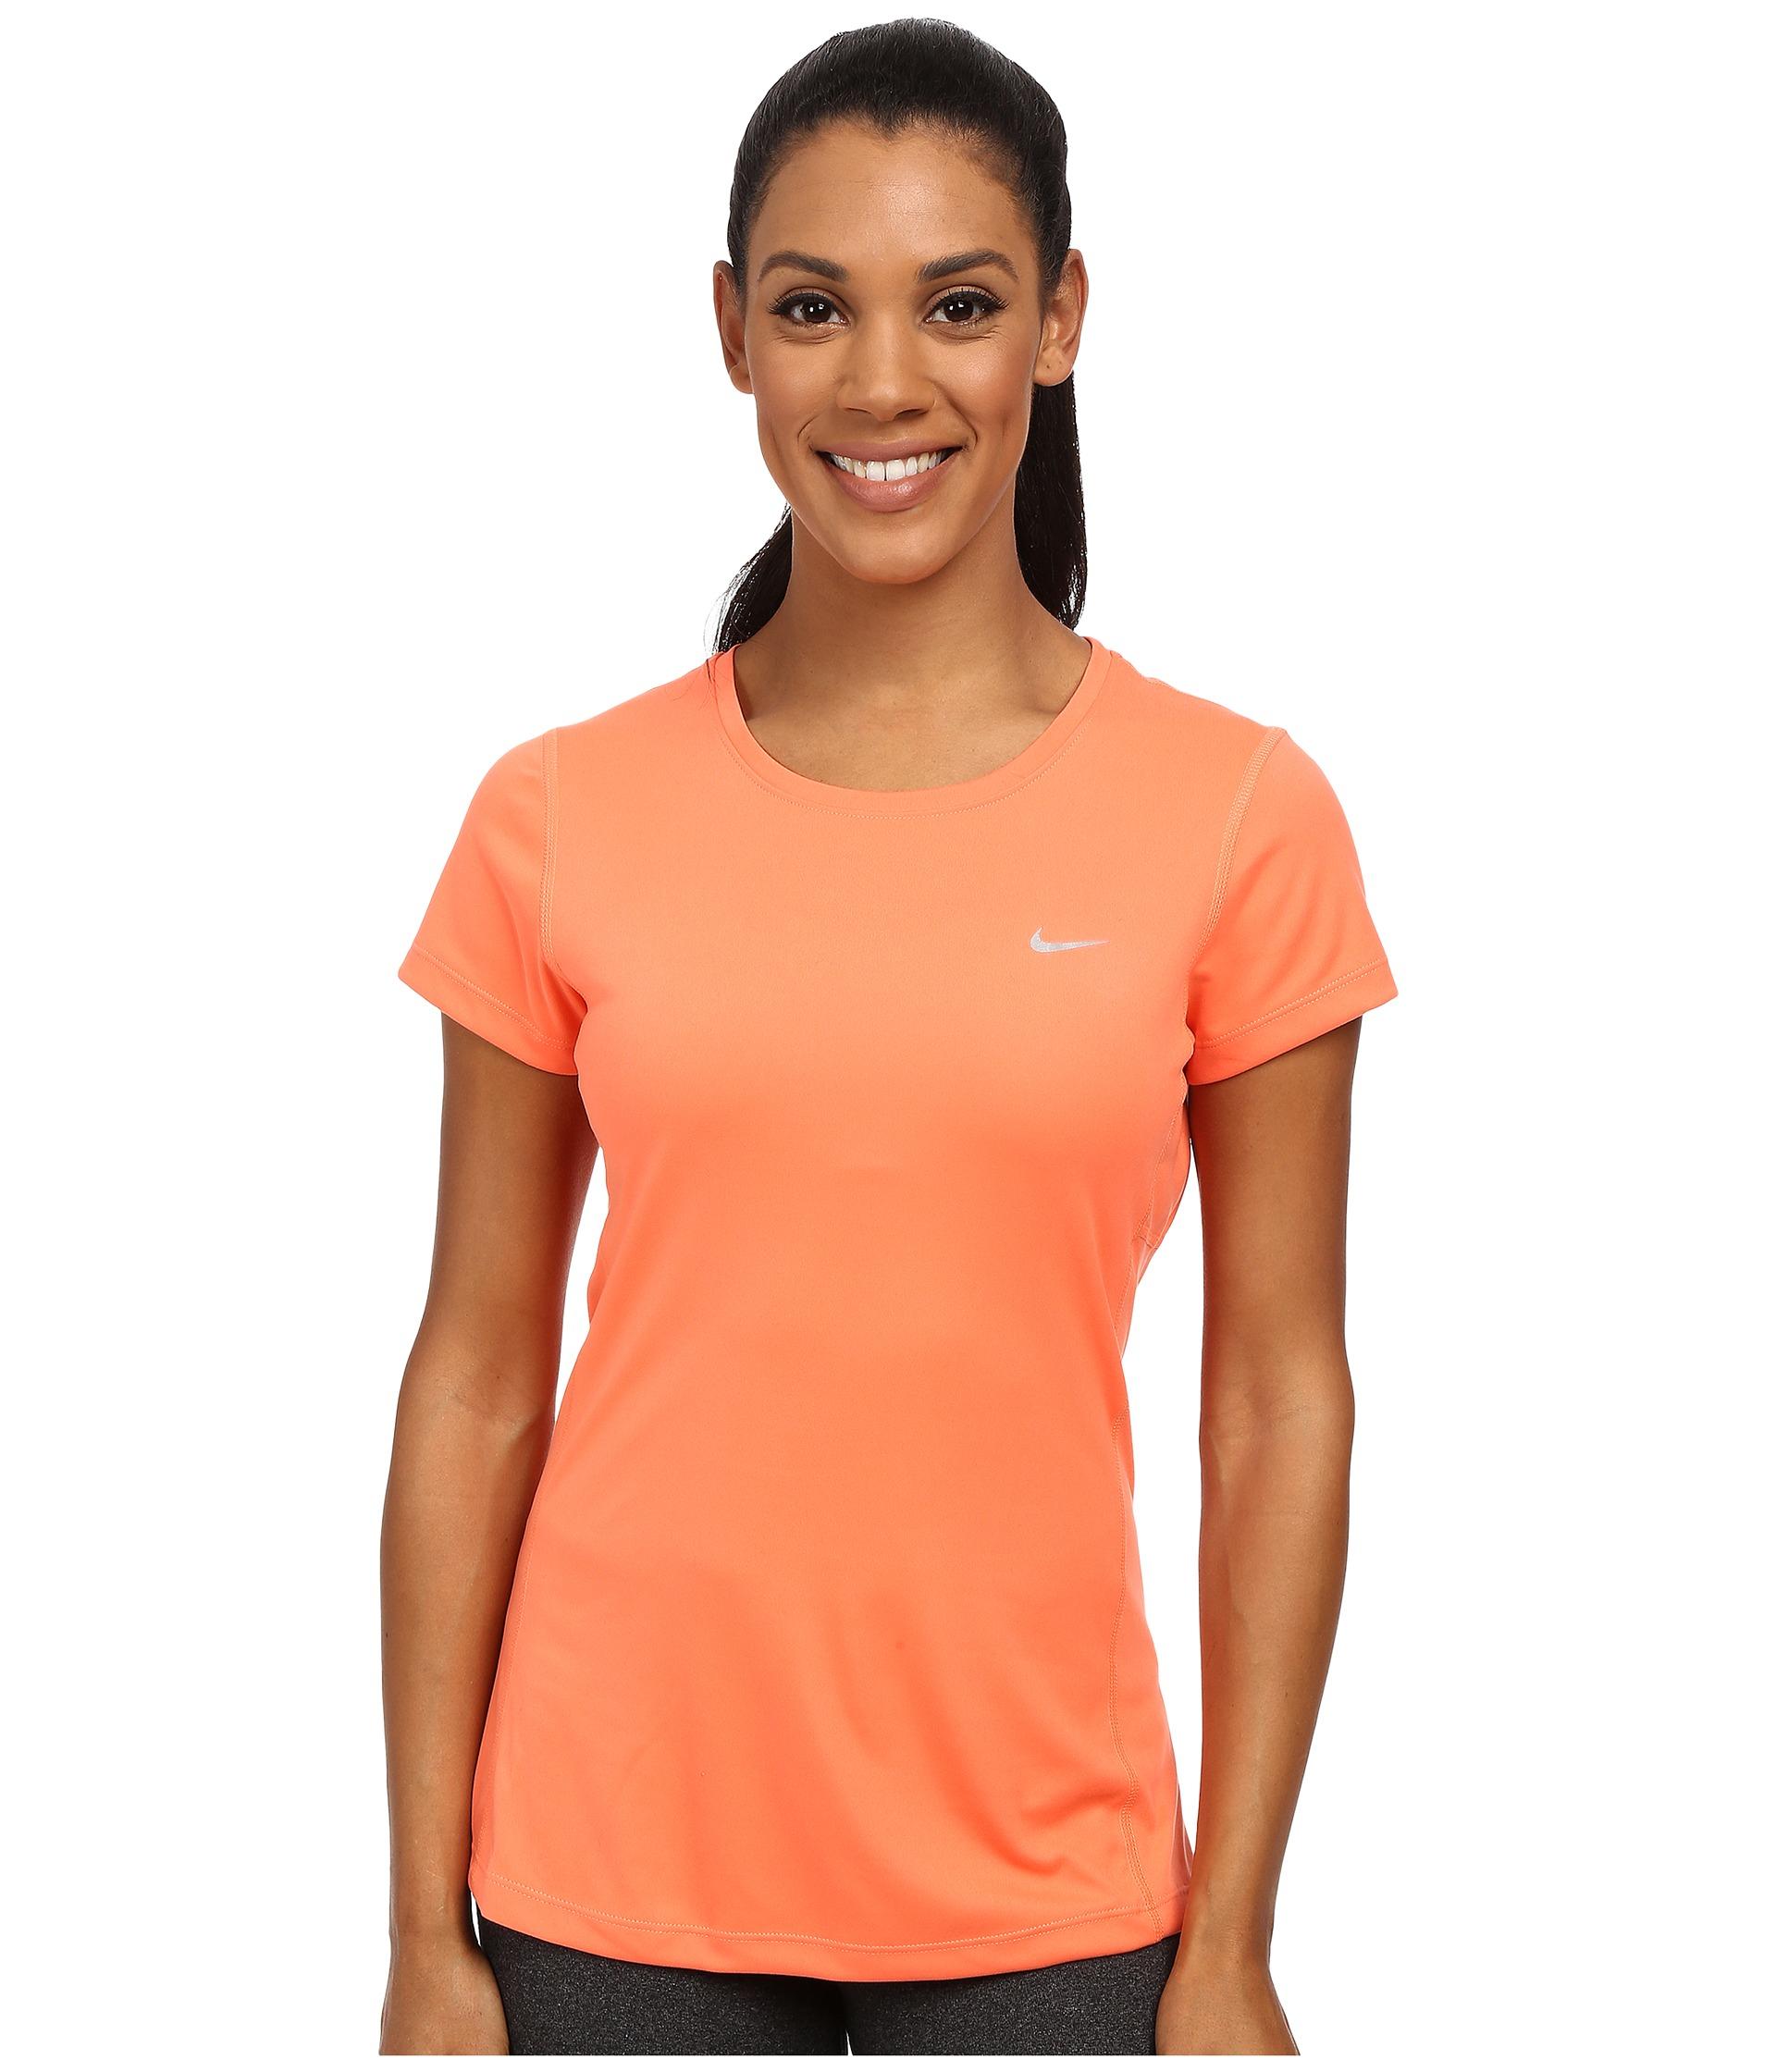 sale retailer 00cb9 b0801 Nike Dri-fit™ Miler Short Sleeve Top in Orange - Lyst